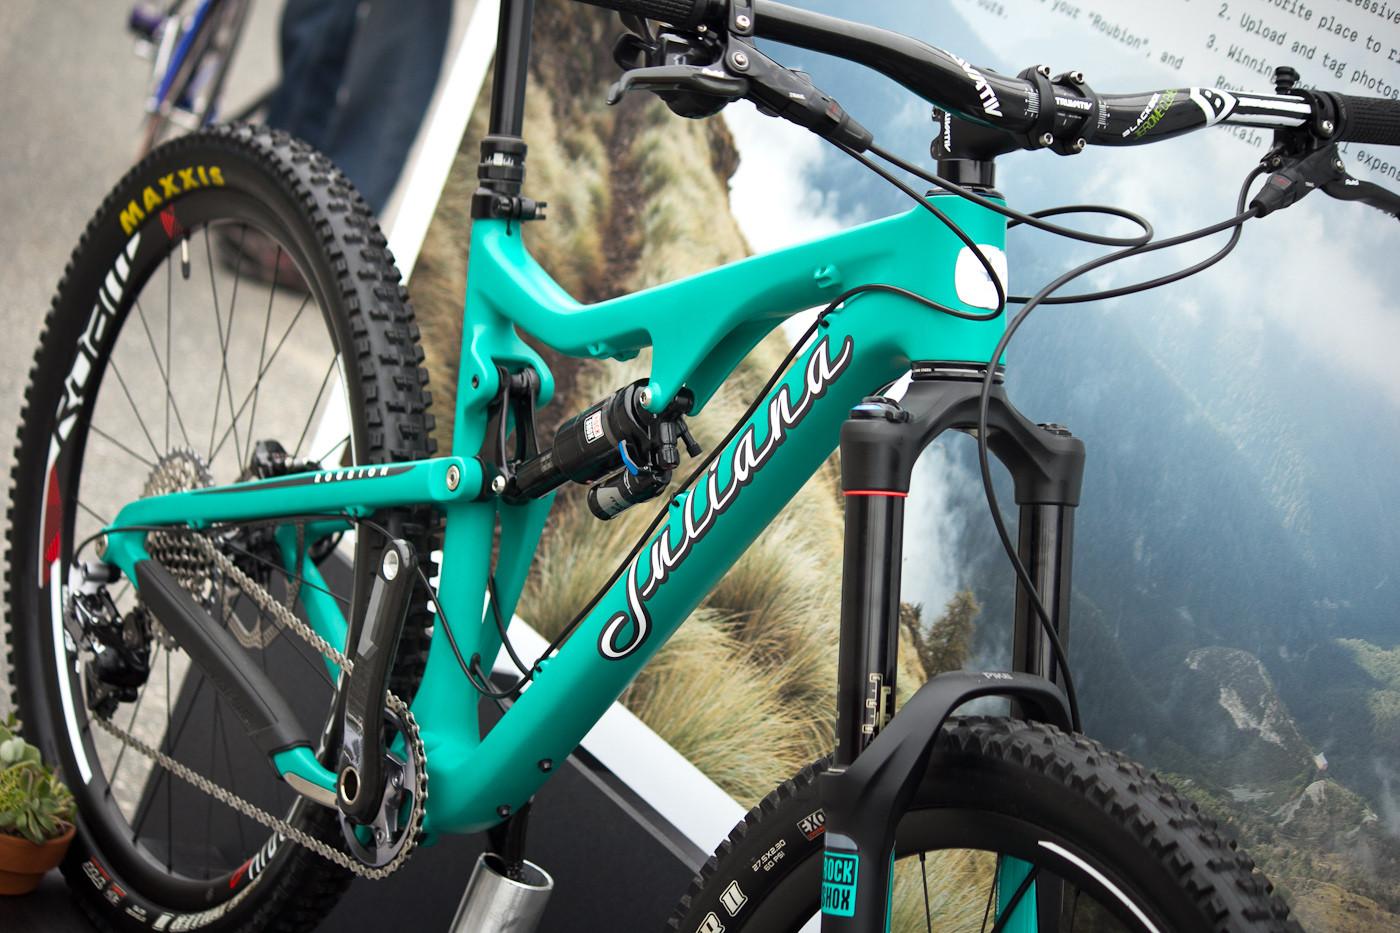 2015 Juliana Roubion - Sea Otter Classic - 2014 Sea Otter Classic Pit Bits - Final Edition - Mountain Biking Pictures - Vital MTB